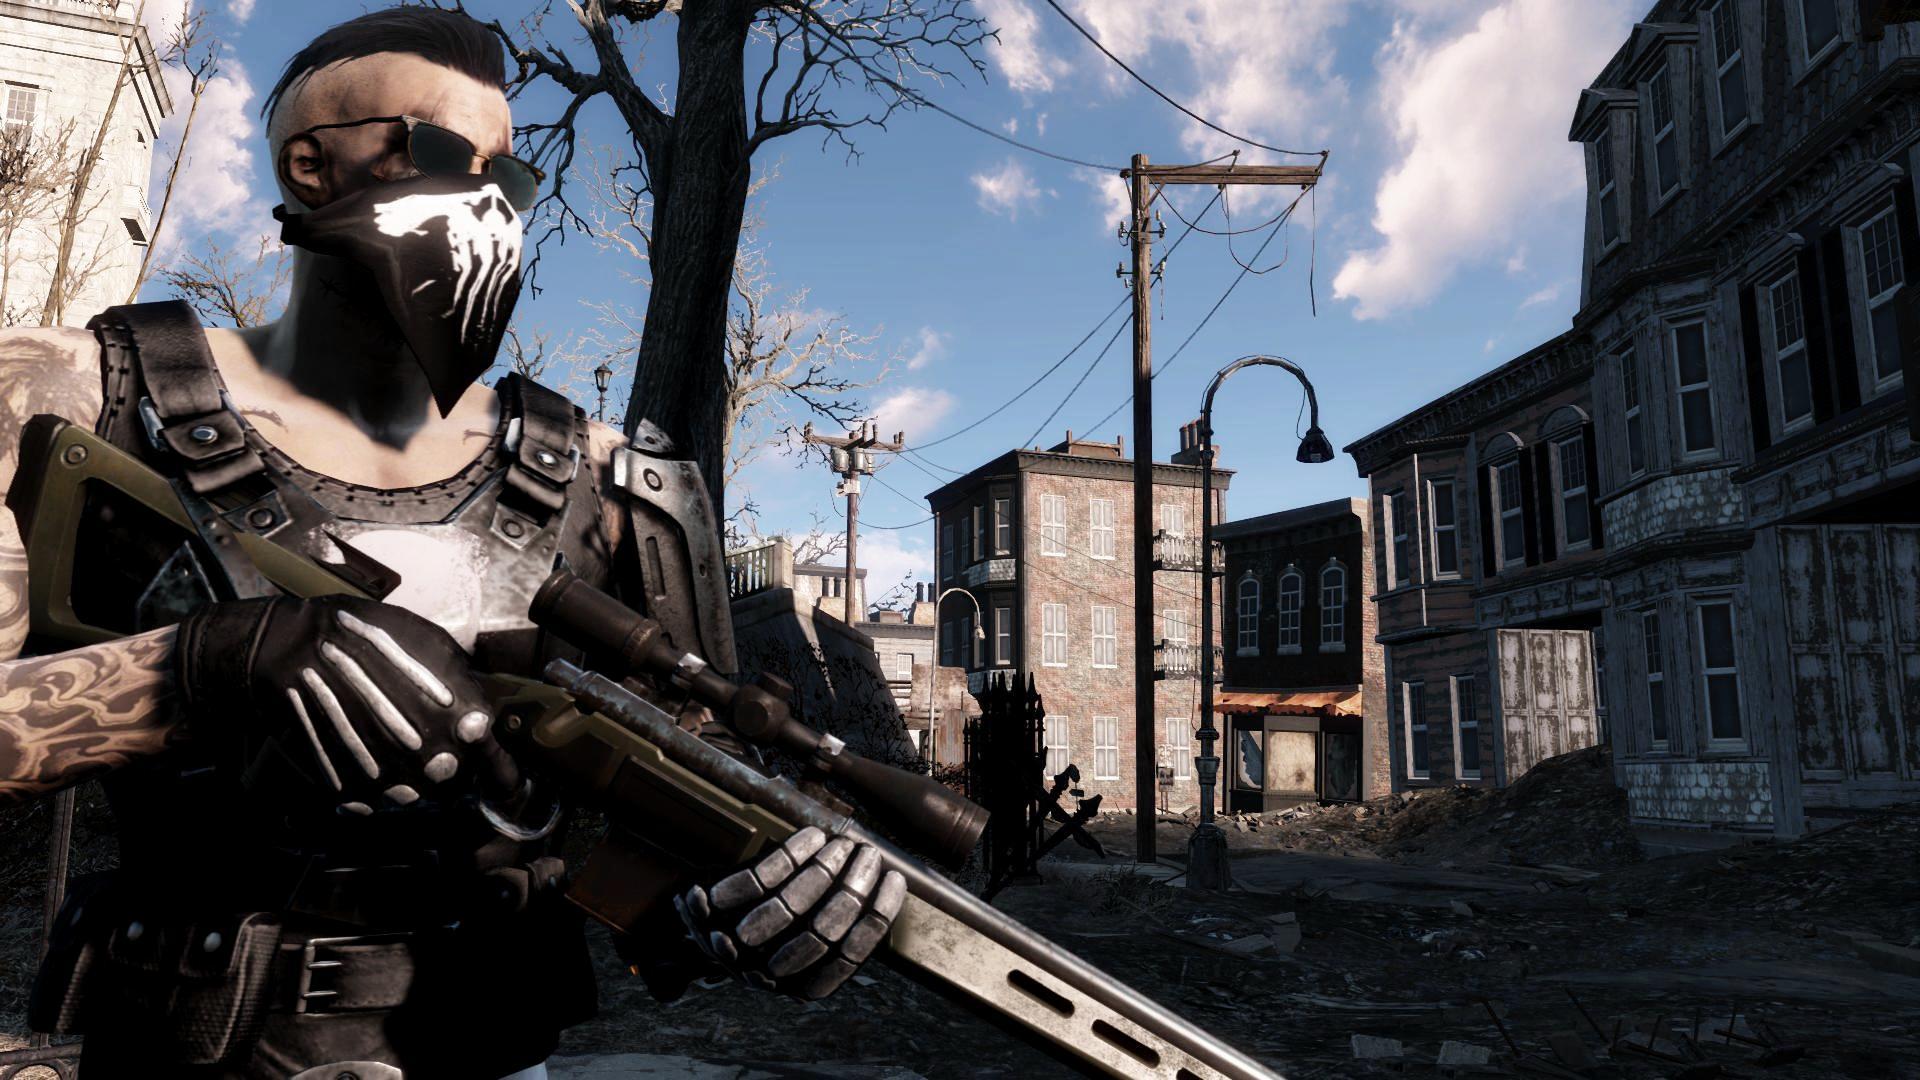 100 Heavy bat Armor Fallout 4 – yasminroohi